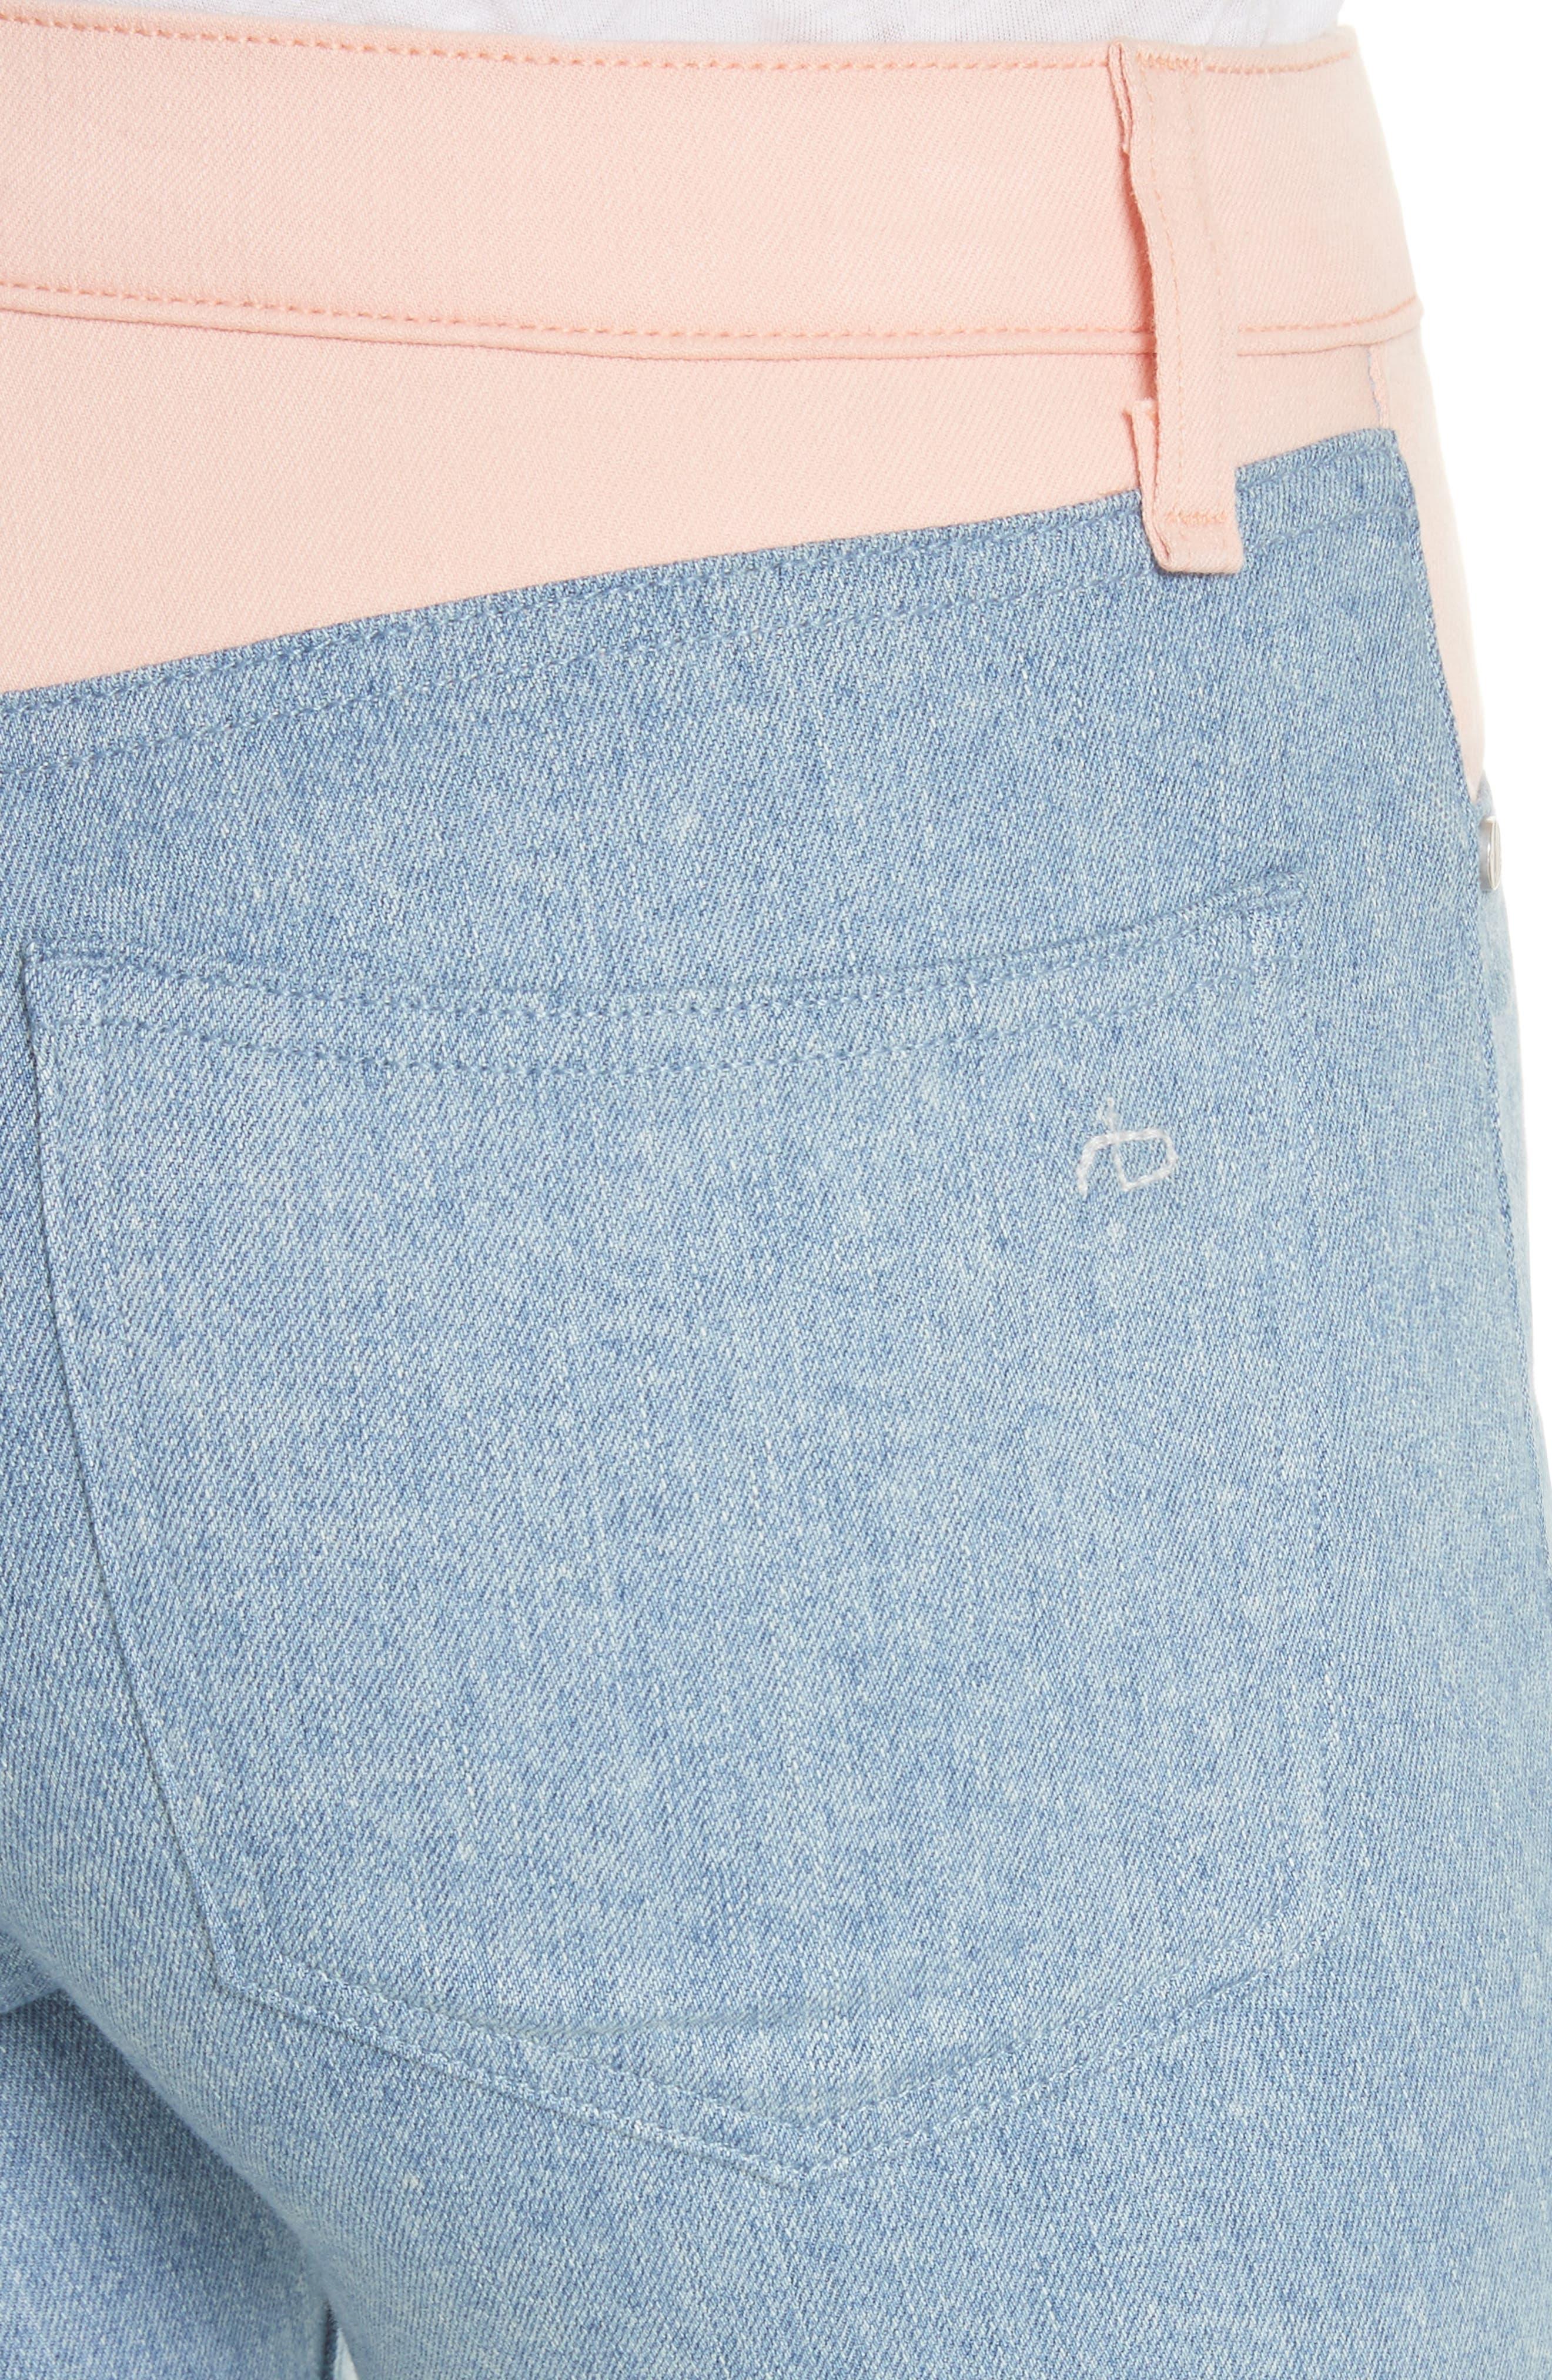 Phila Skinny Jeans,                             Alternate thumbnail 4, color,                             Nelly/ Prairie